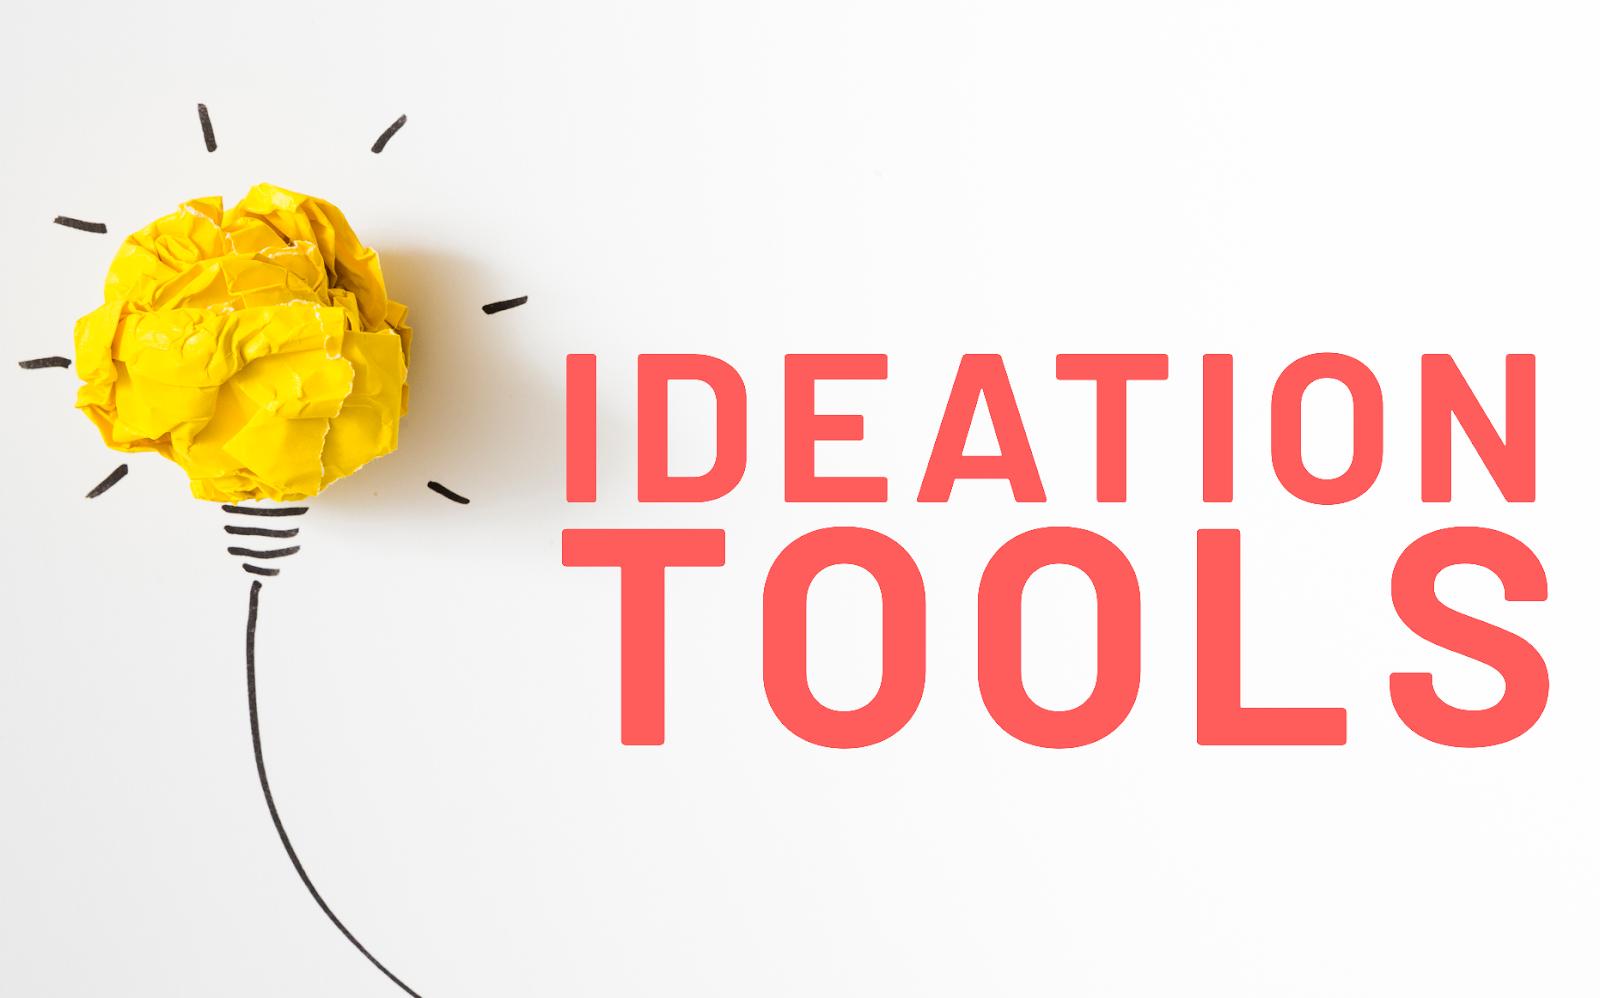 tools for brainstorming, brainstorming tools online, brainstorming tools, ideation software tools, ideation tools